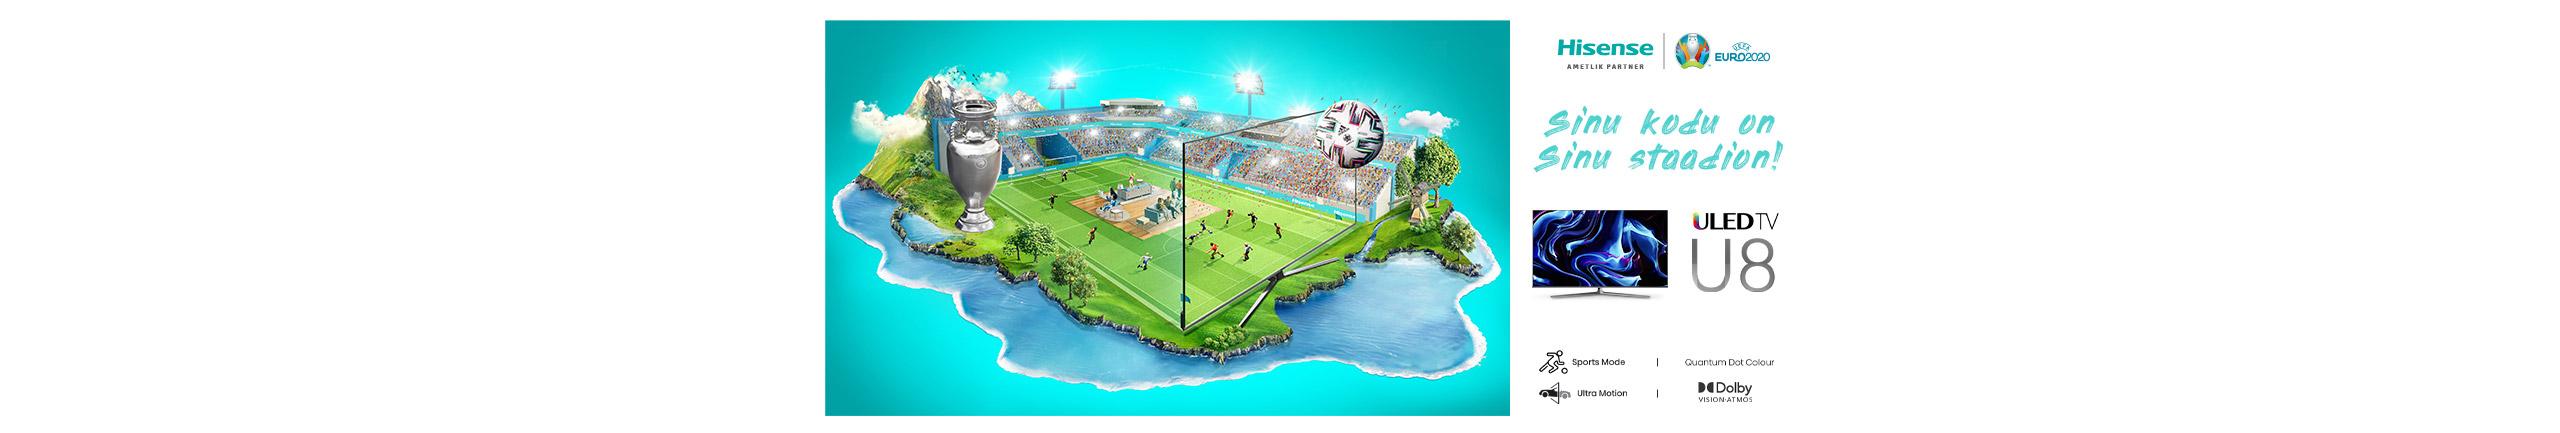 Hisense - Sinu kodu on Sinu staadion!